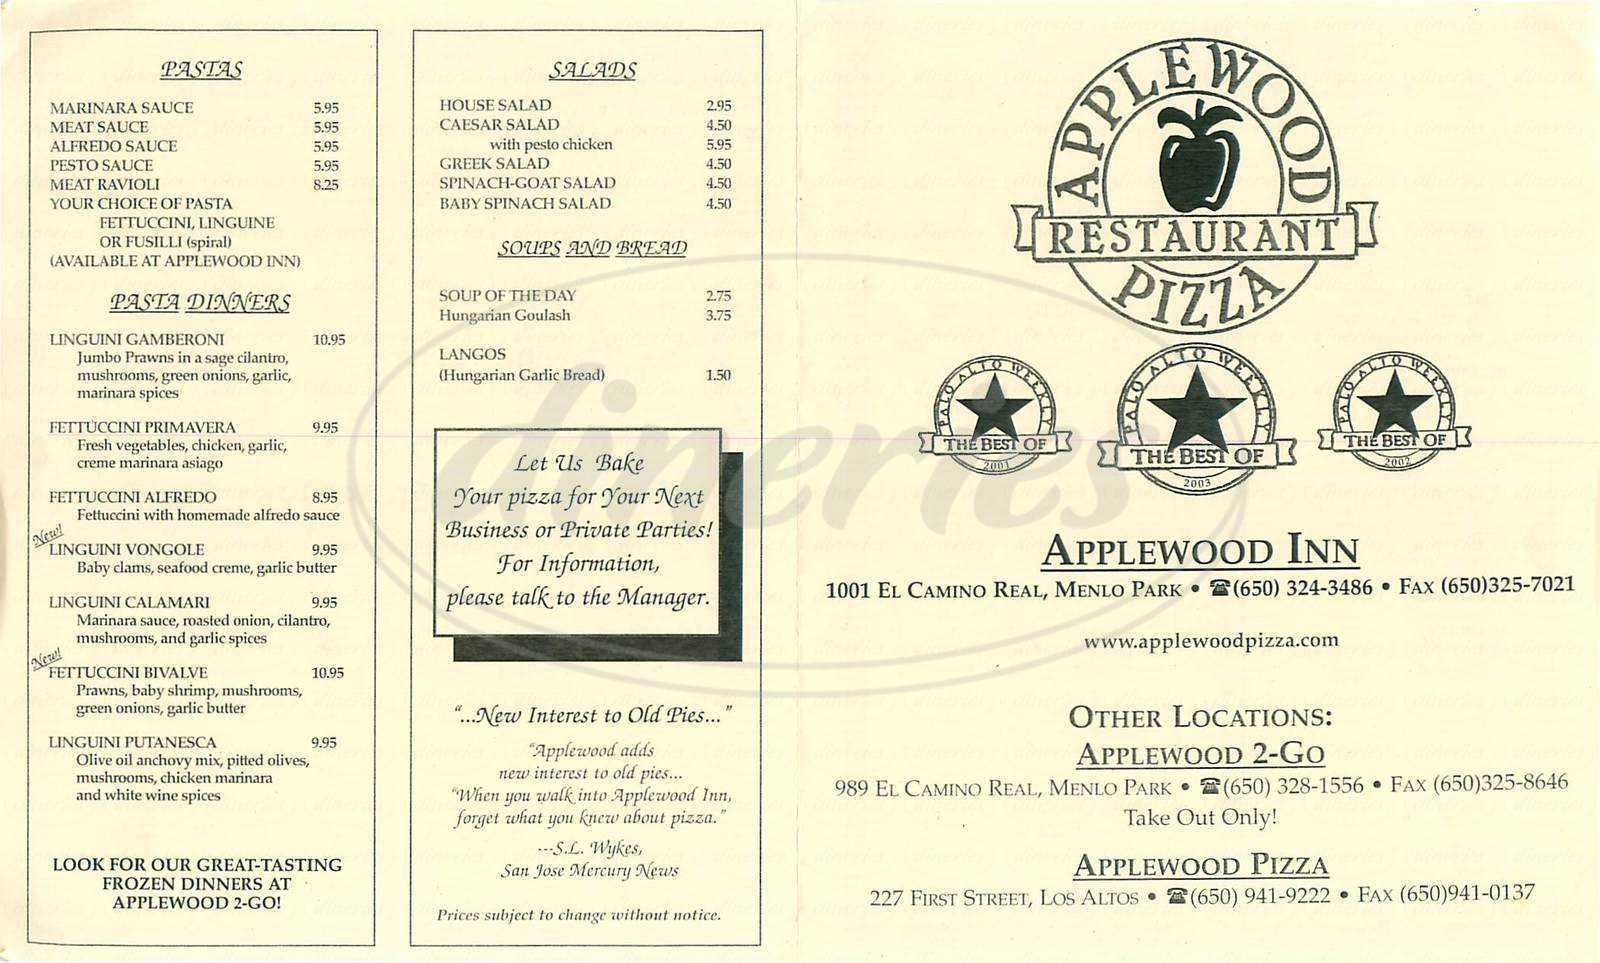 menu for Applewood Inn & Pizza